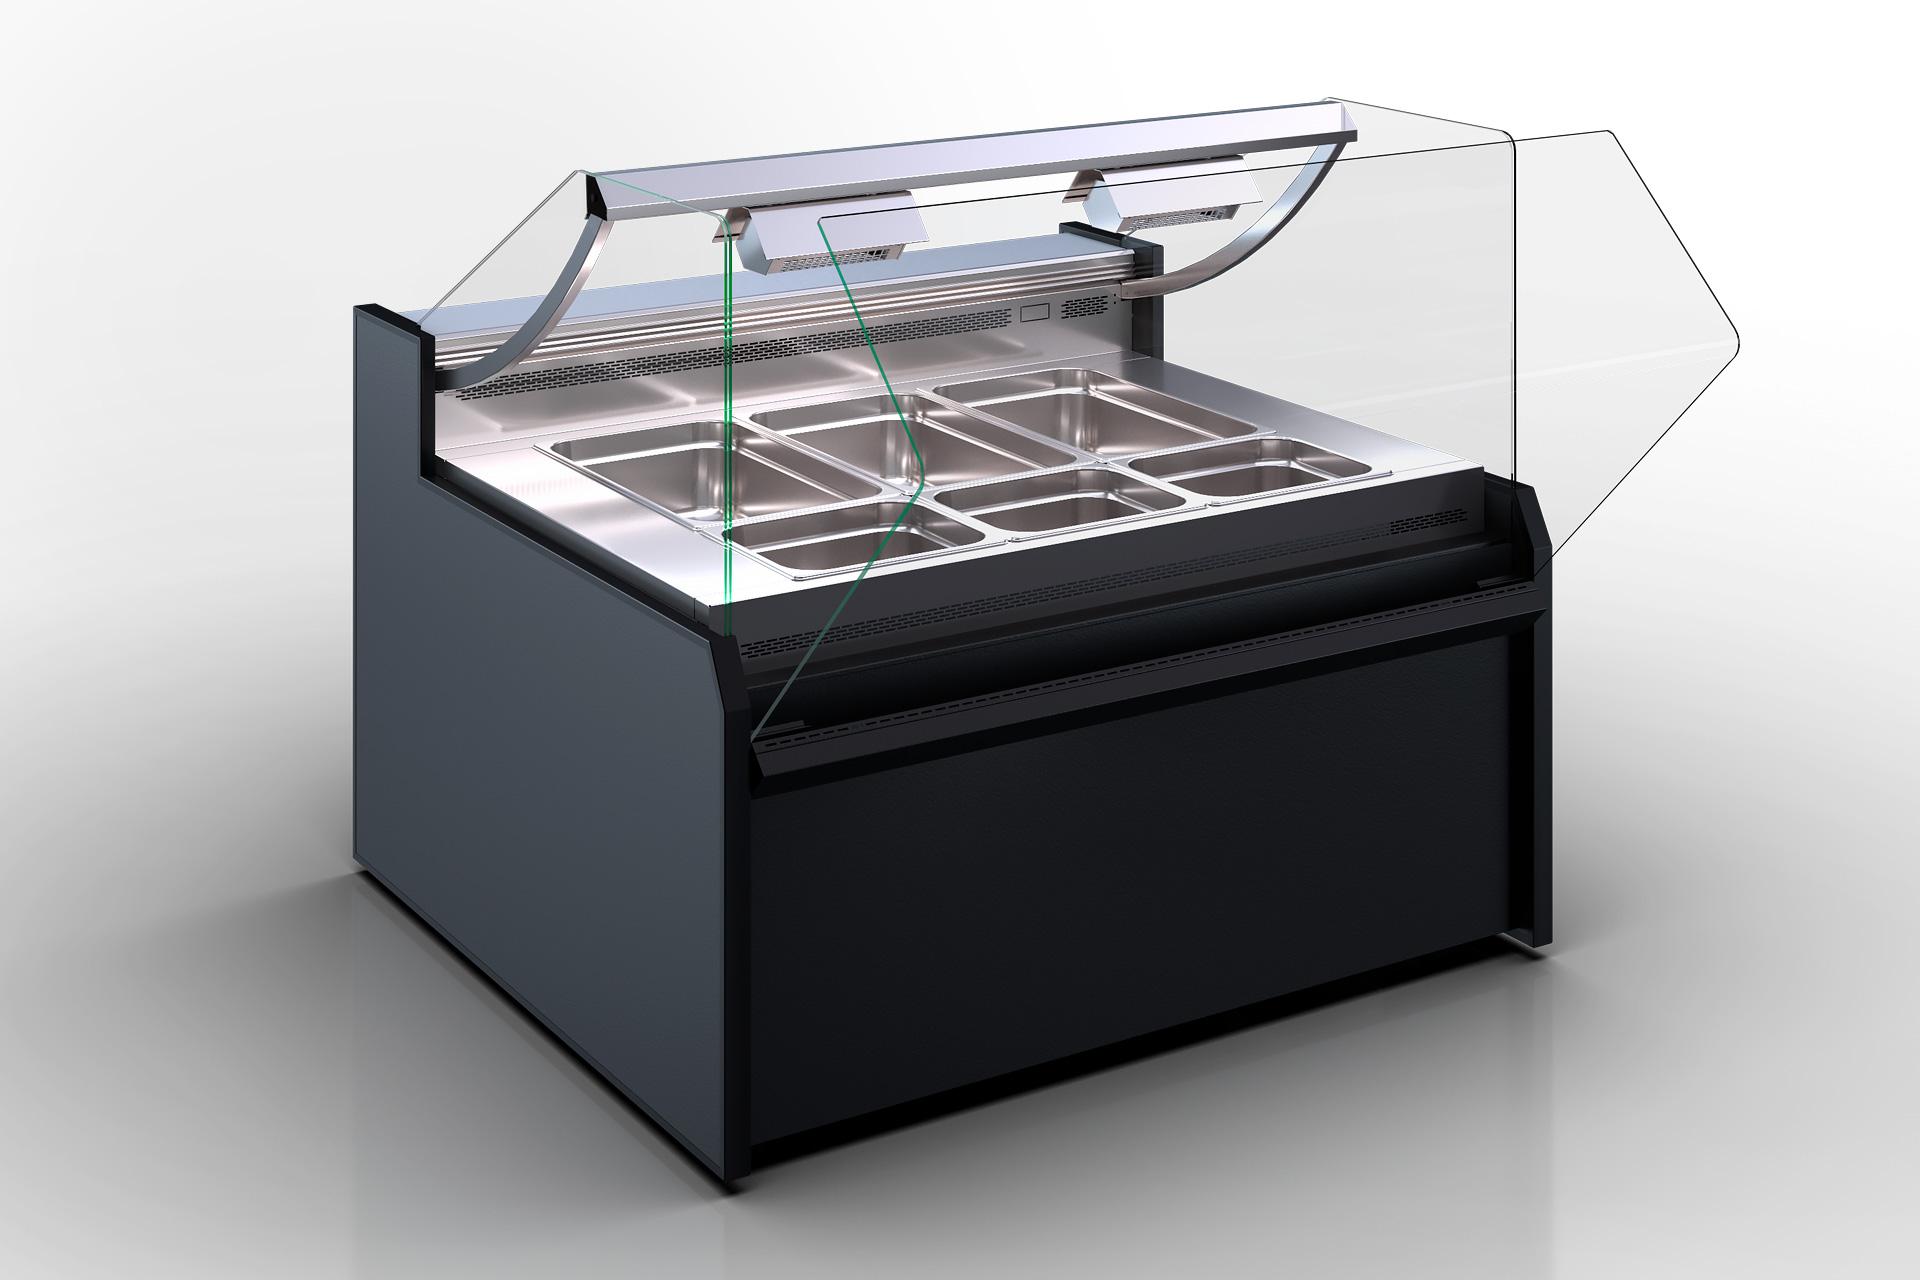 Wärme-Vitrine Missouri NC 120 heat BM OS 120